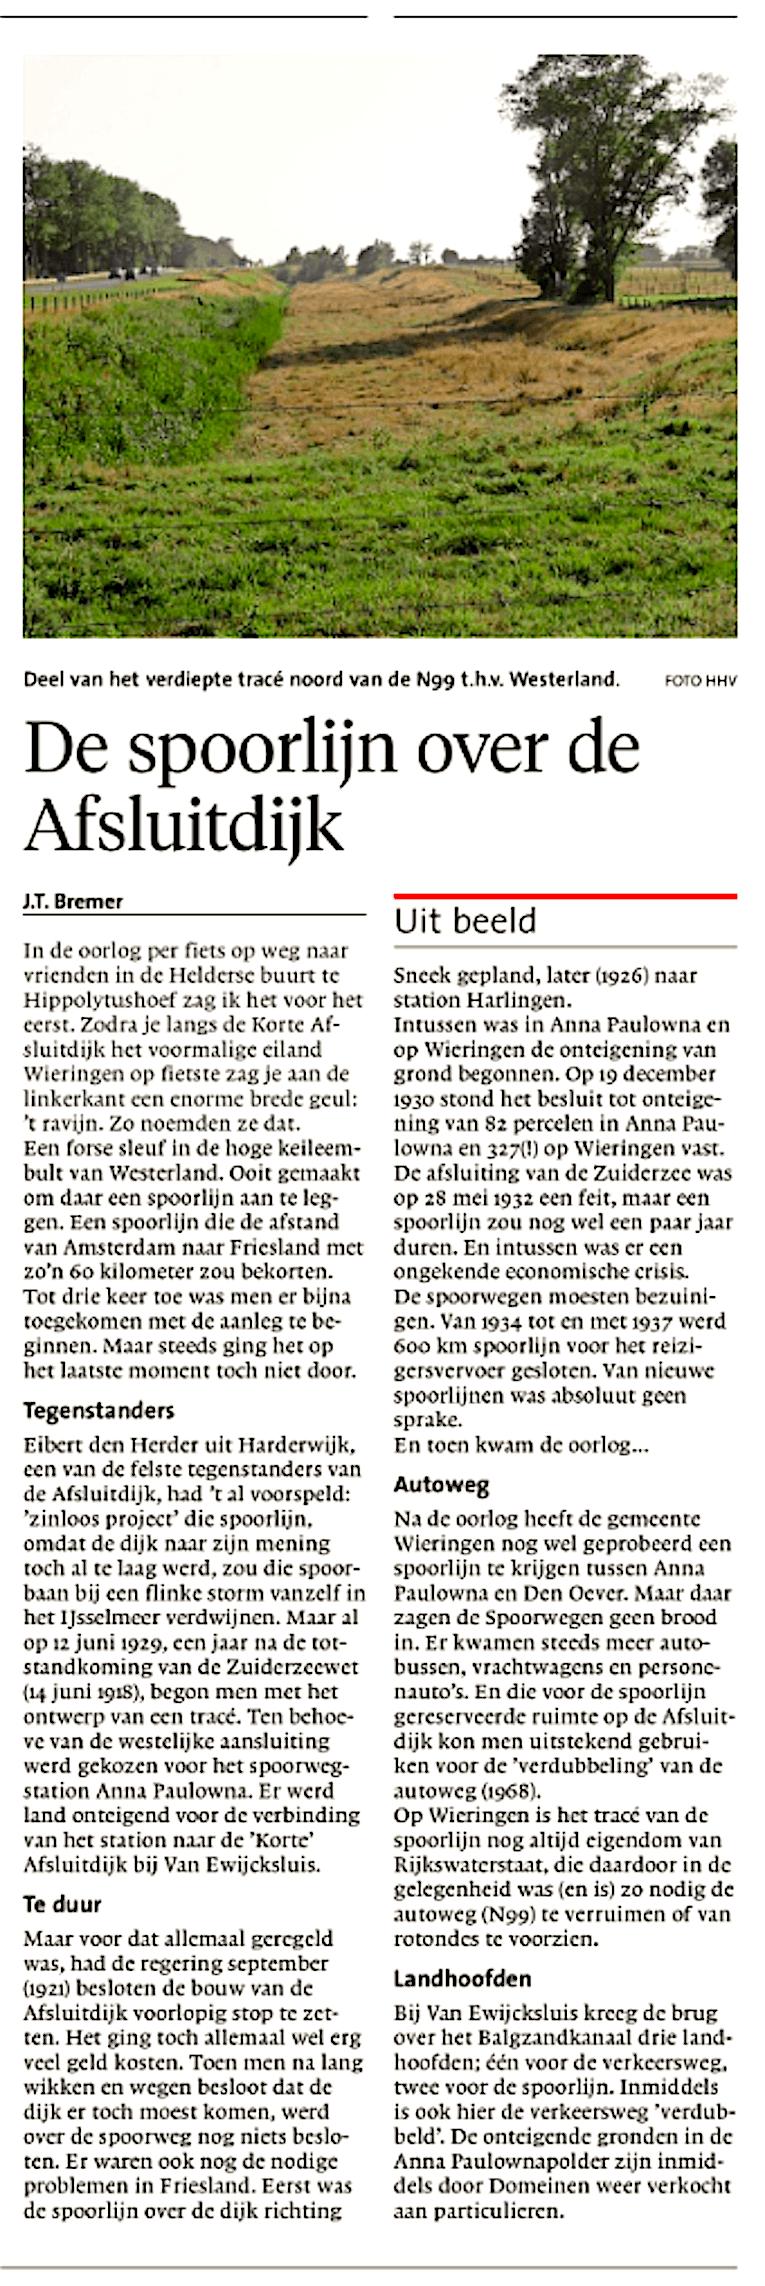 Helderse Courant, 27 augustus 2018